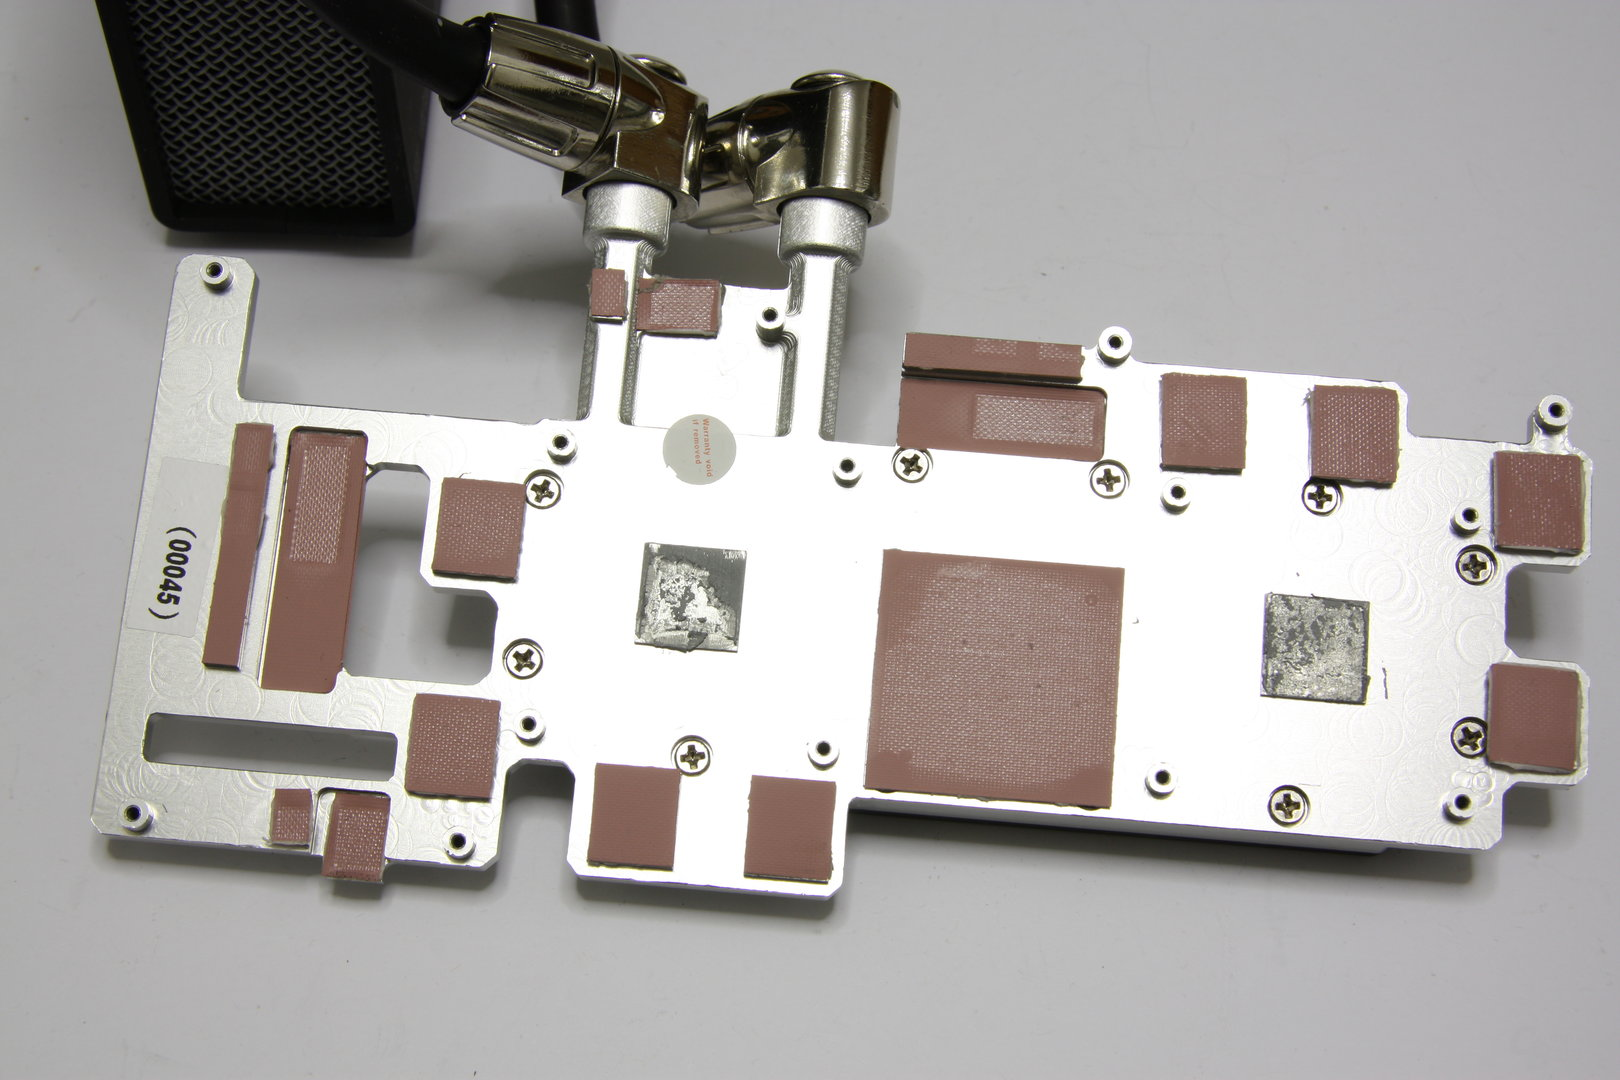 Radeon HD 3870 X2 Atomic Kühlerrückseite